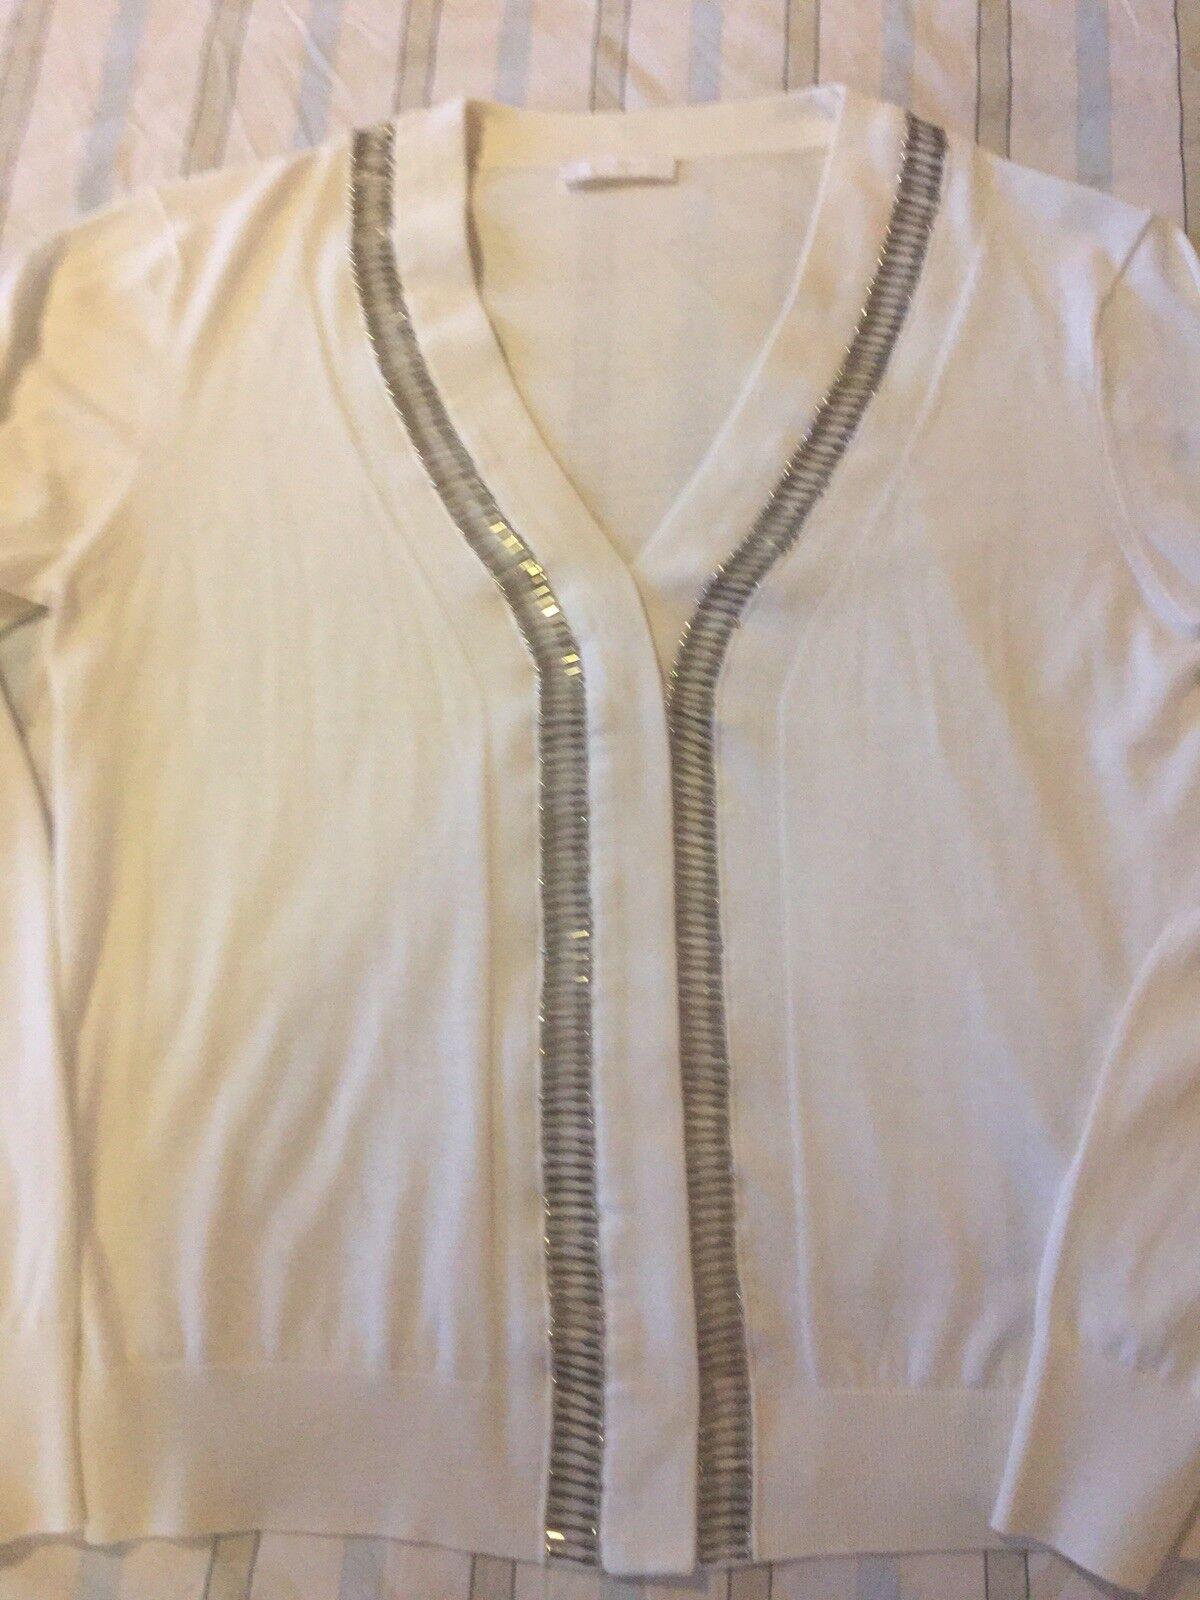 Chloe Luxurious Luxurious Luxurious Metallic Trim Sweater Sz Large Iconic Milk Cream Ivory Beige 4d29c9